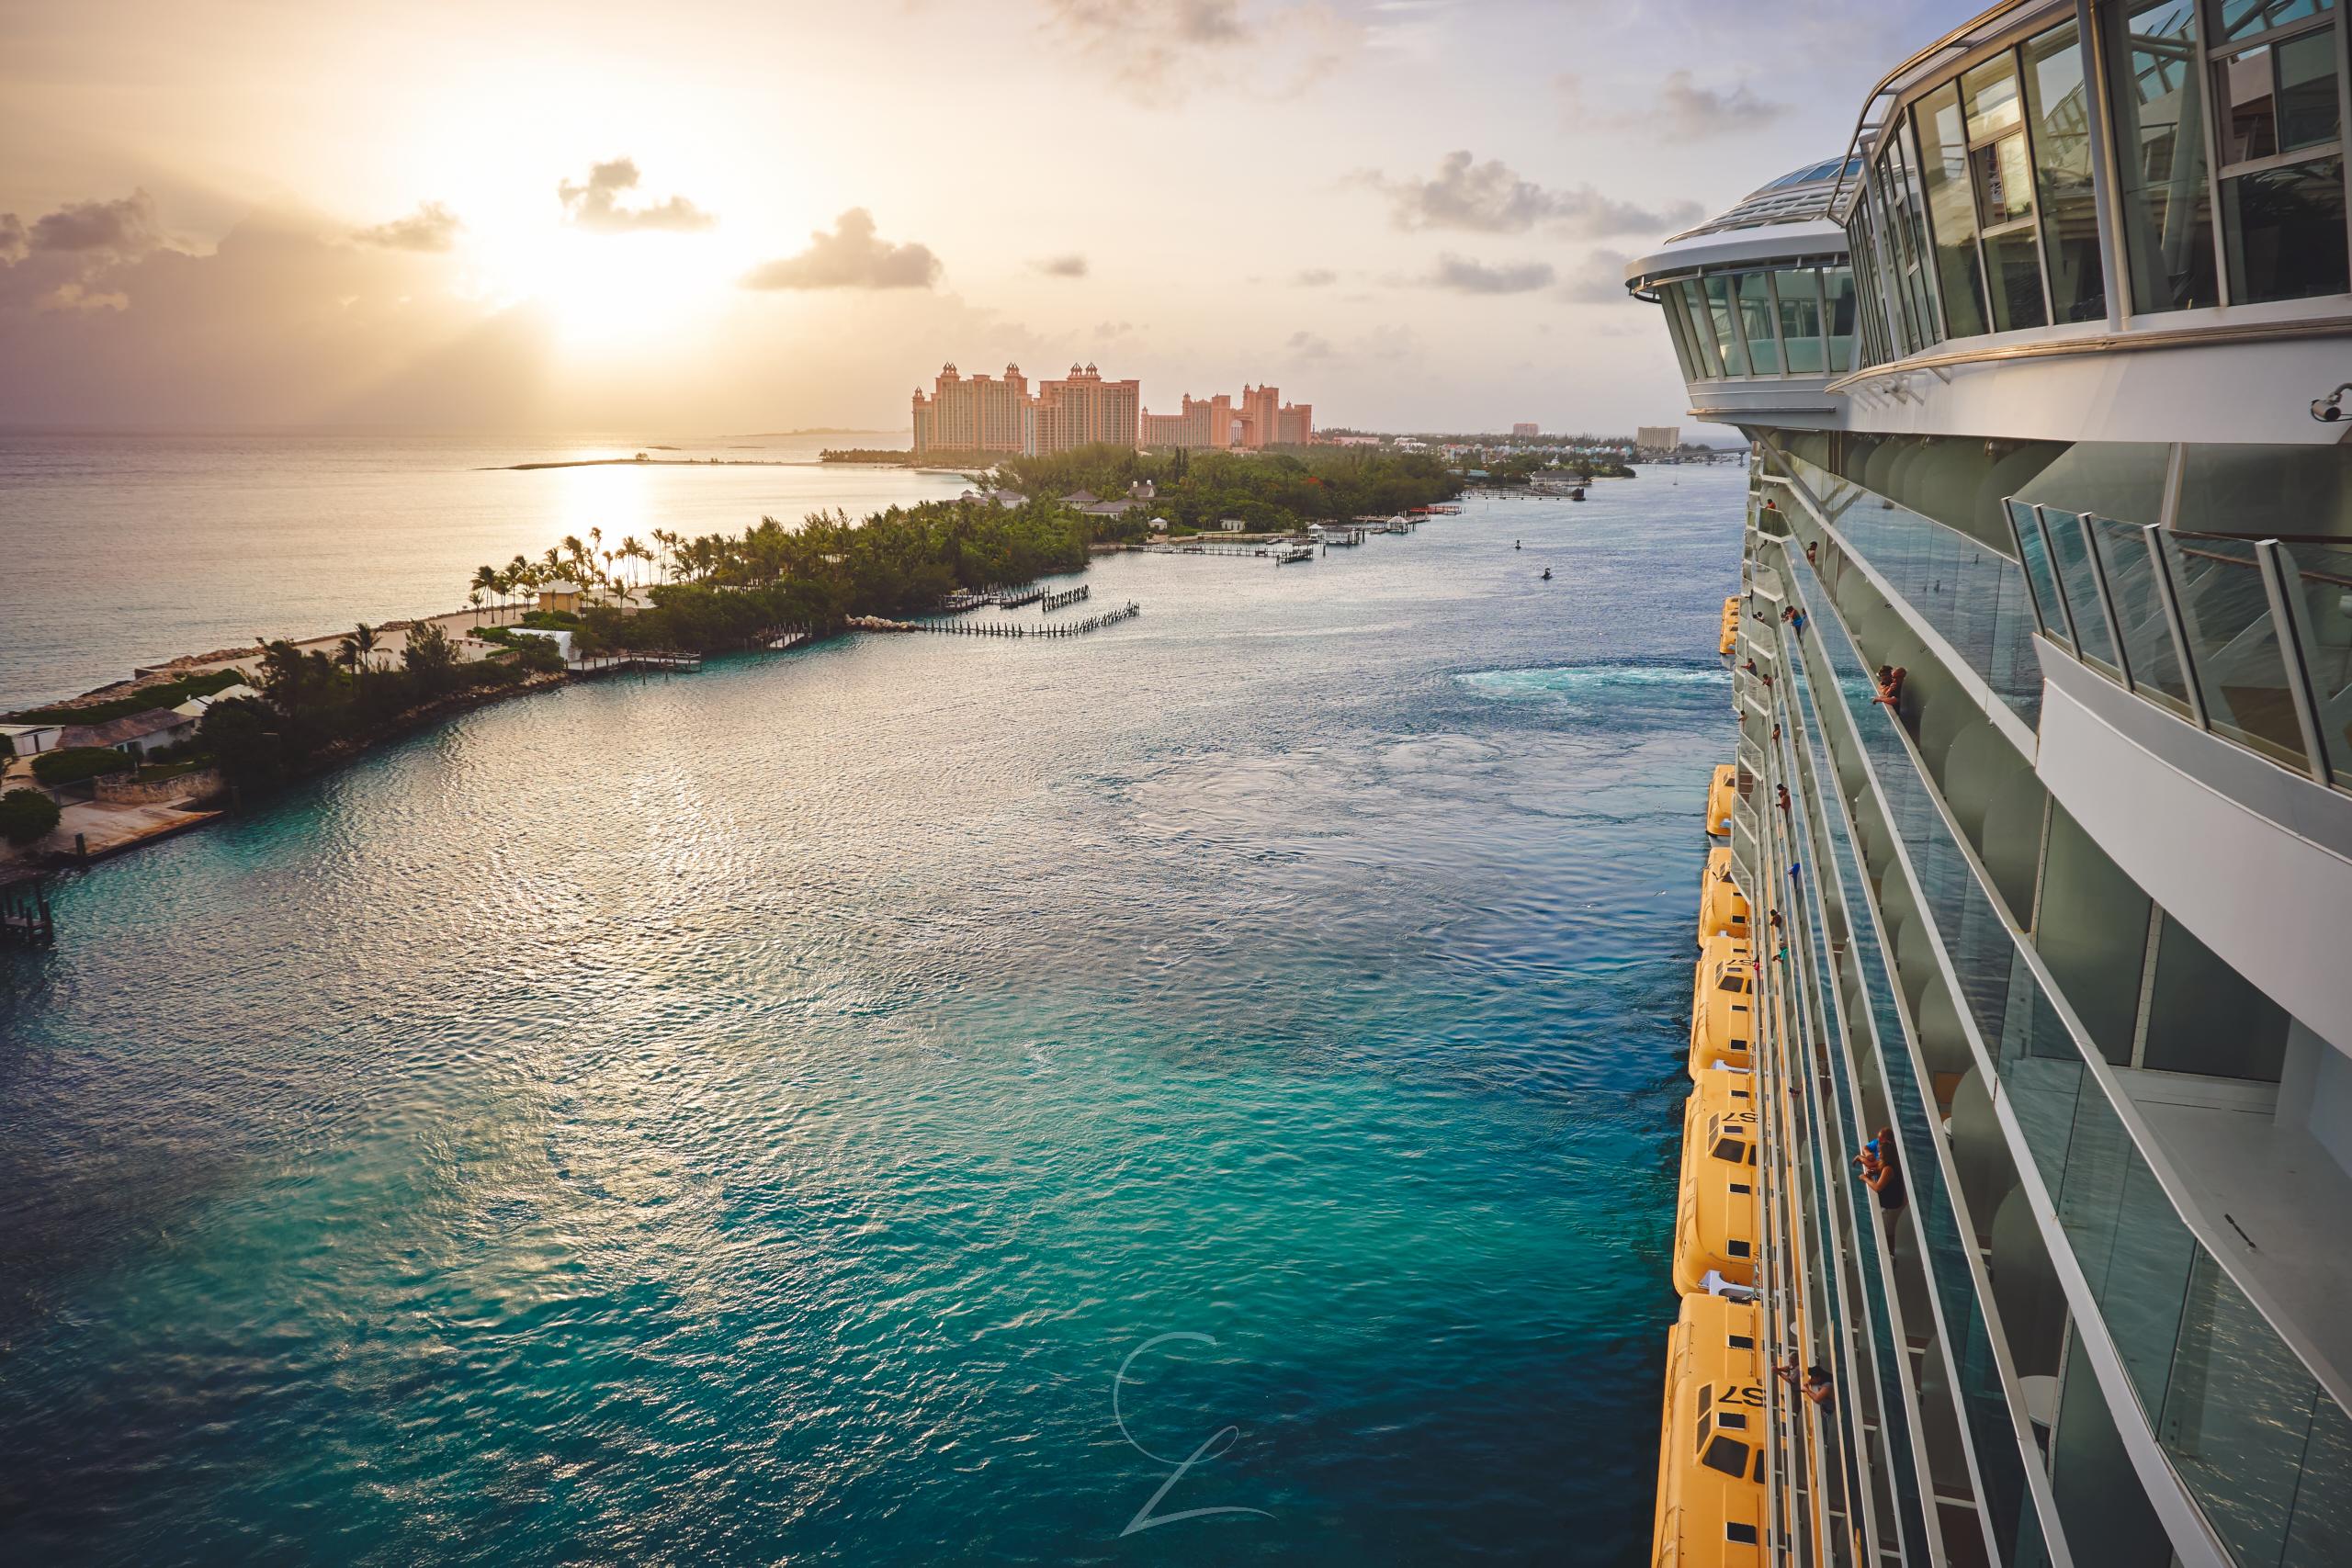 Atlantic Drive Atlantic Dr Nassau The Bahamas Sunrise